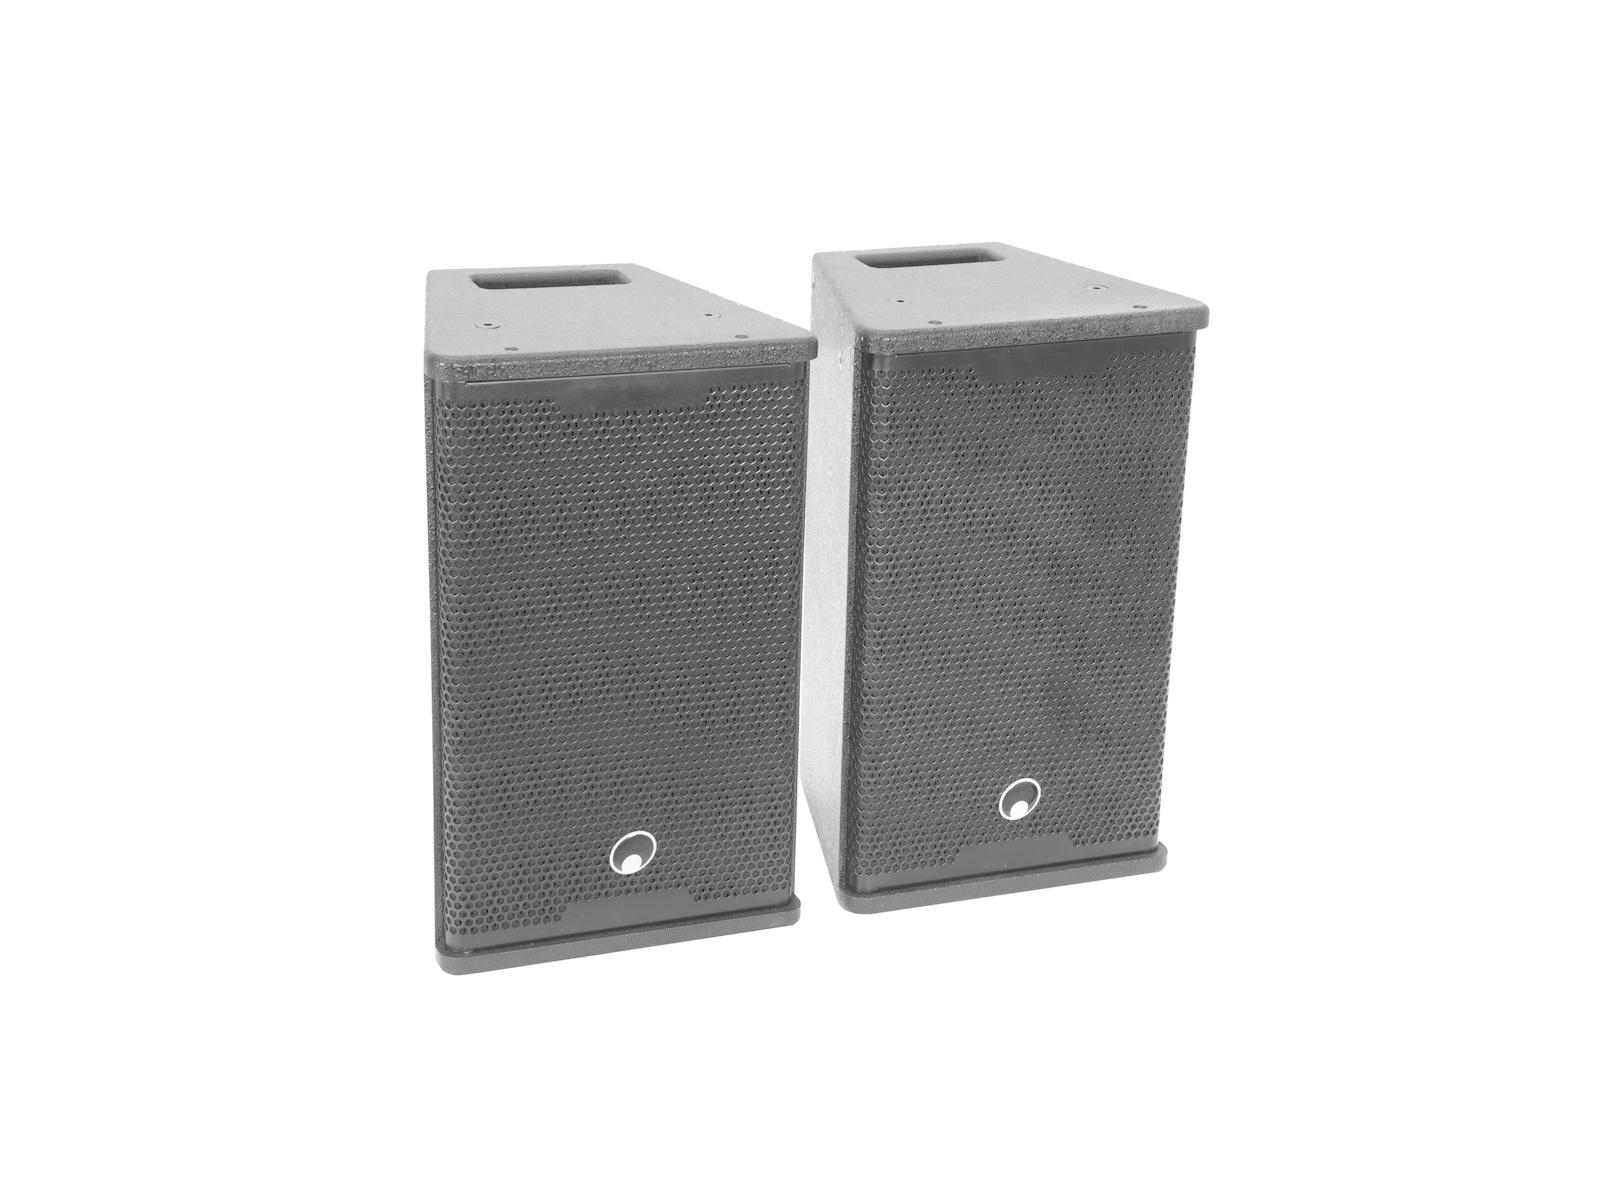 OMNITRONIC OMNITRONIC Set MAXX-1508DSP 2.1 Aktiv-System + Speaker stands